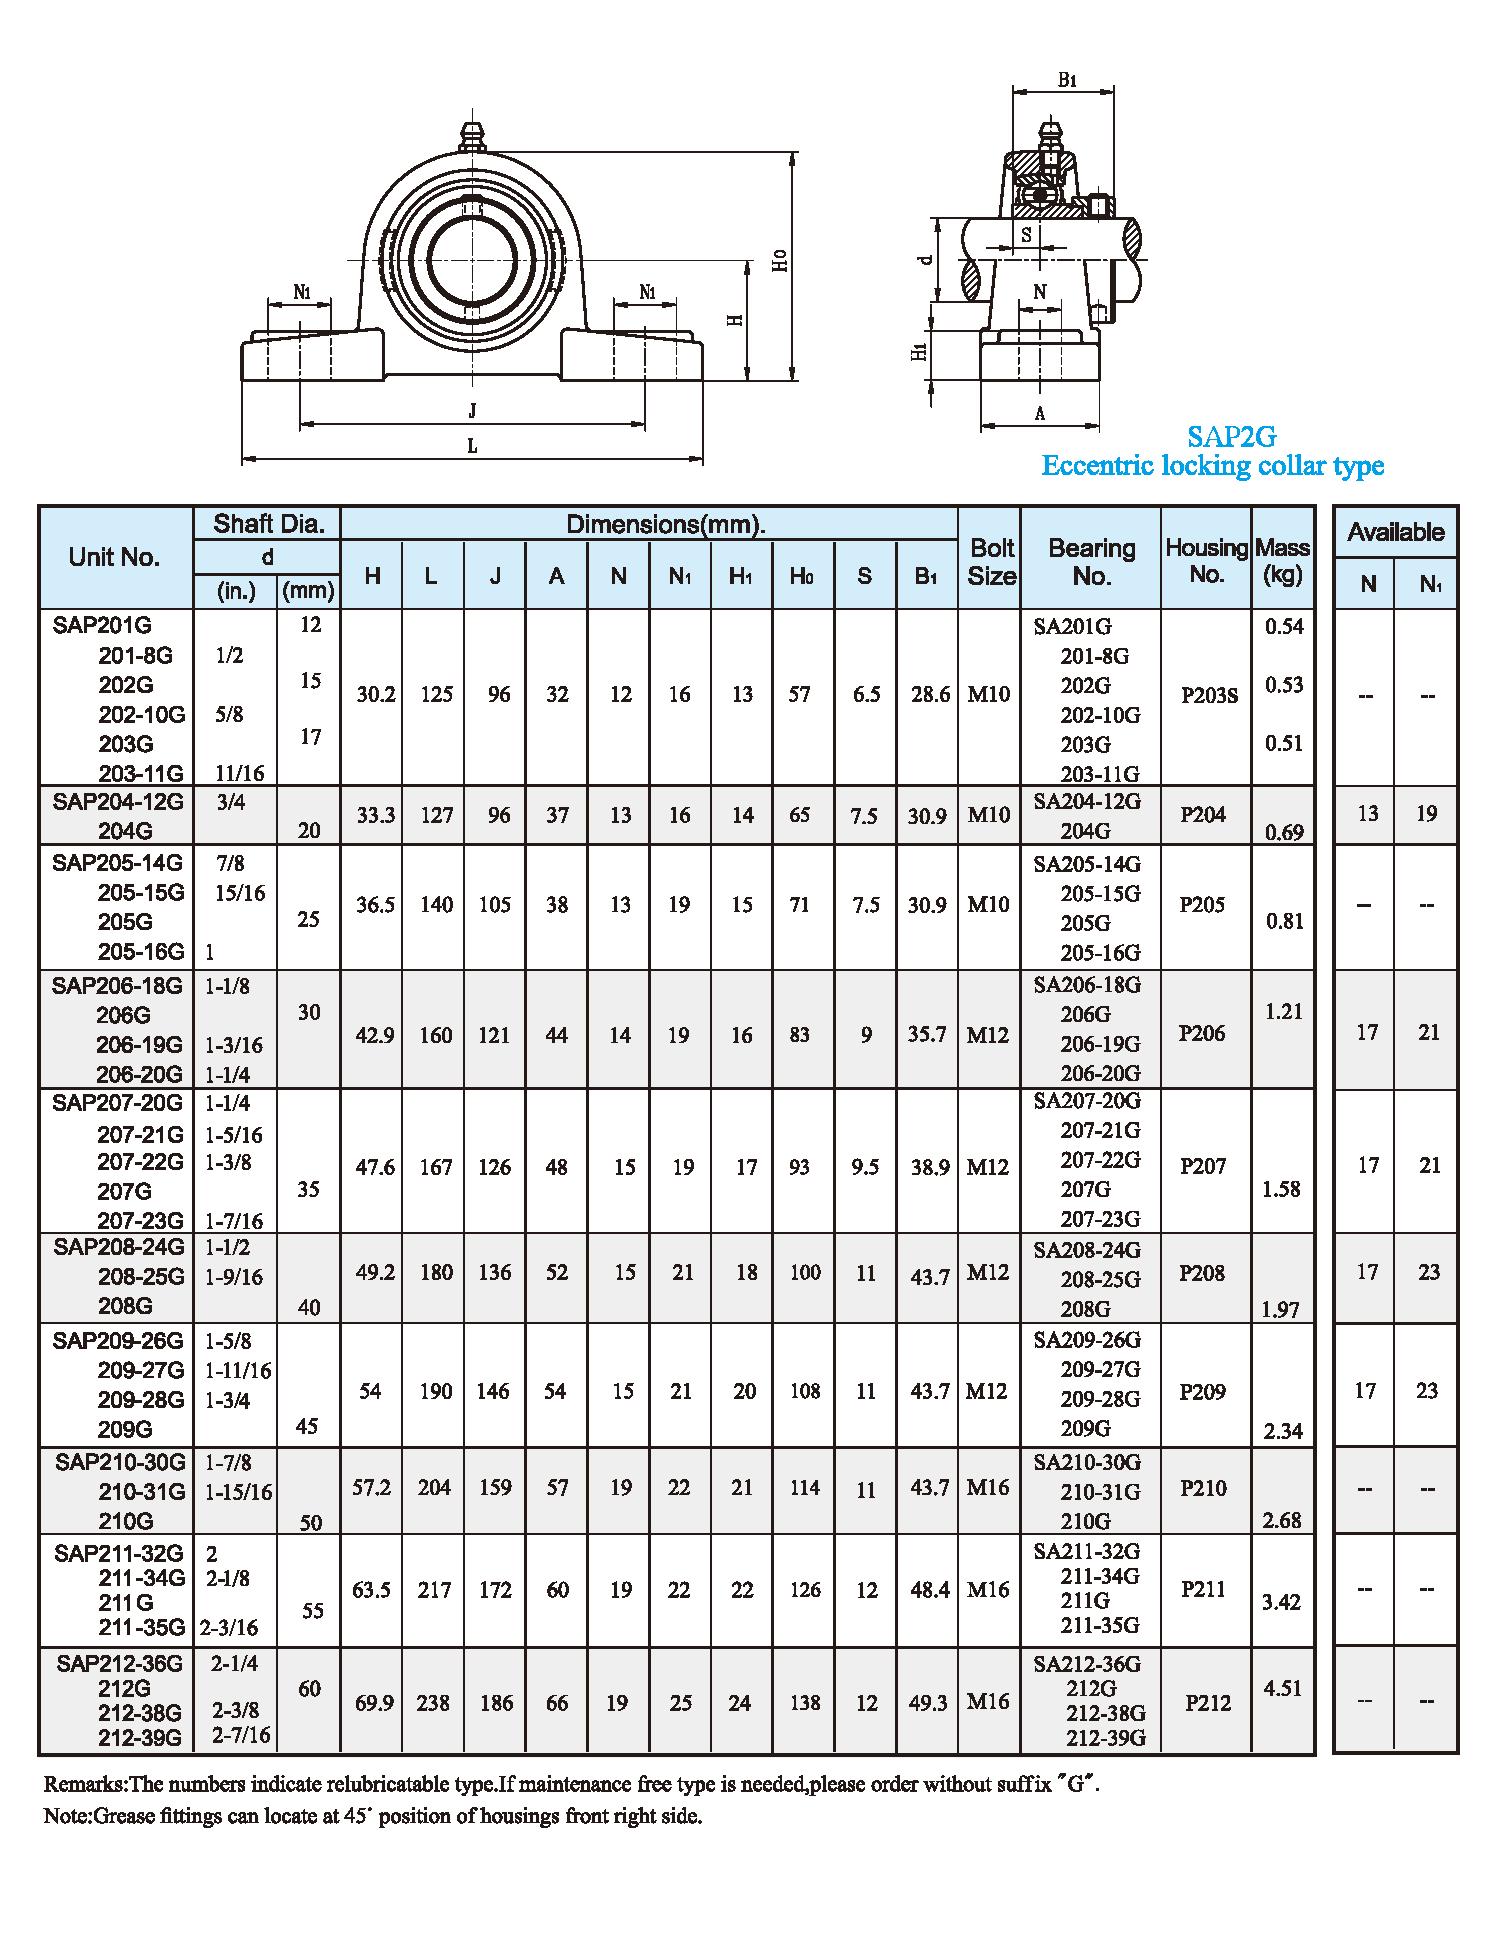 SAP2G Setscrew type